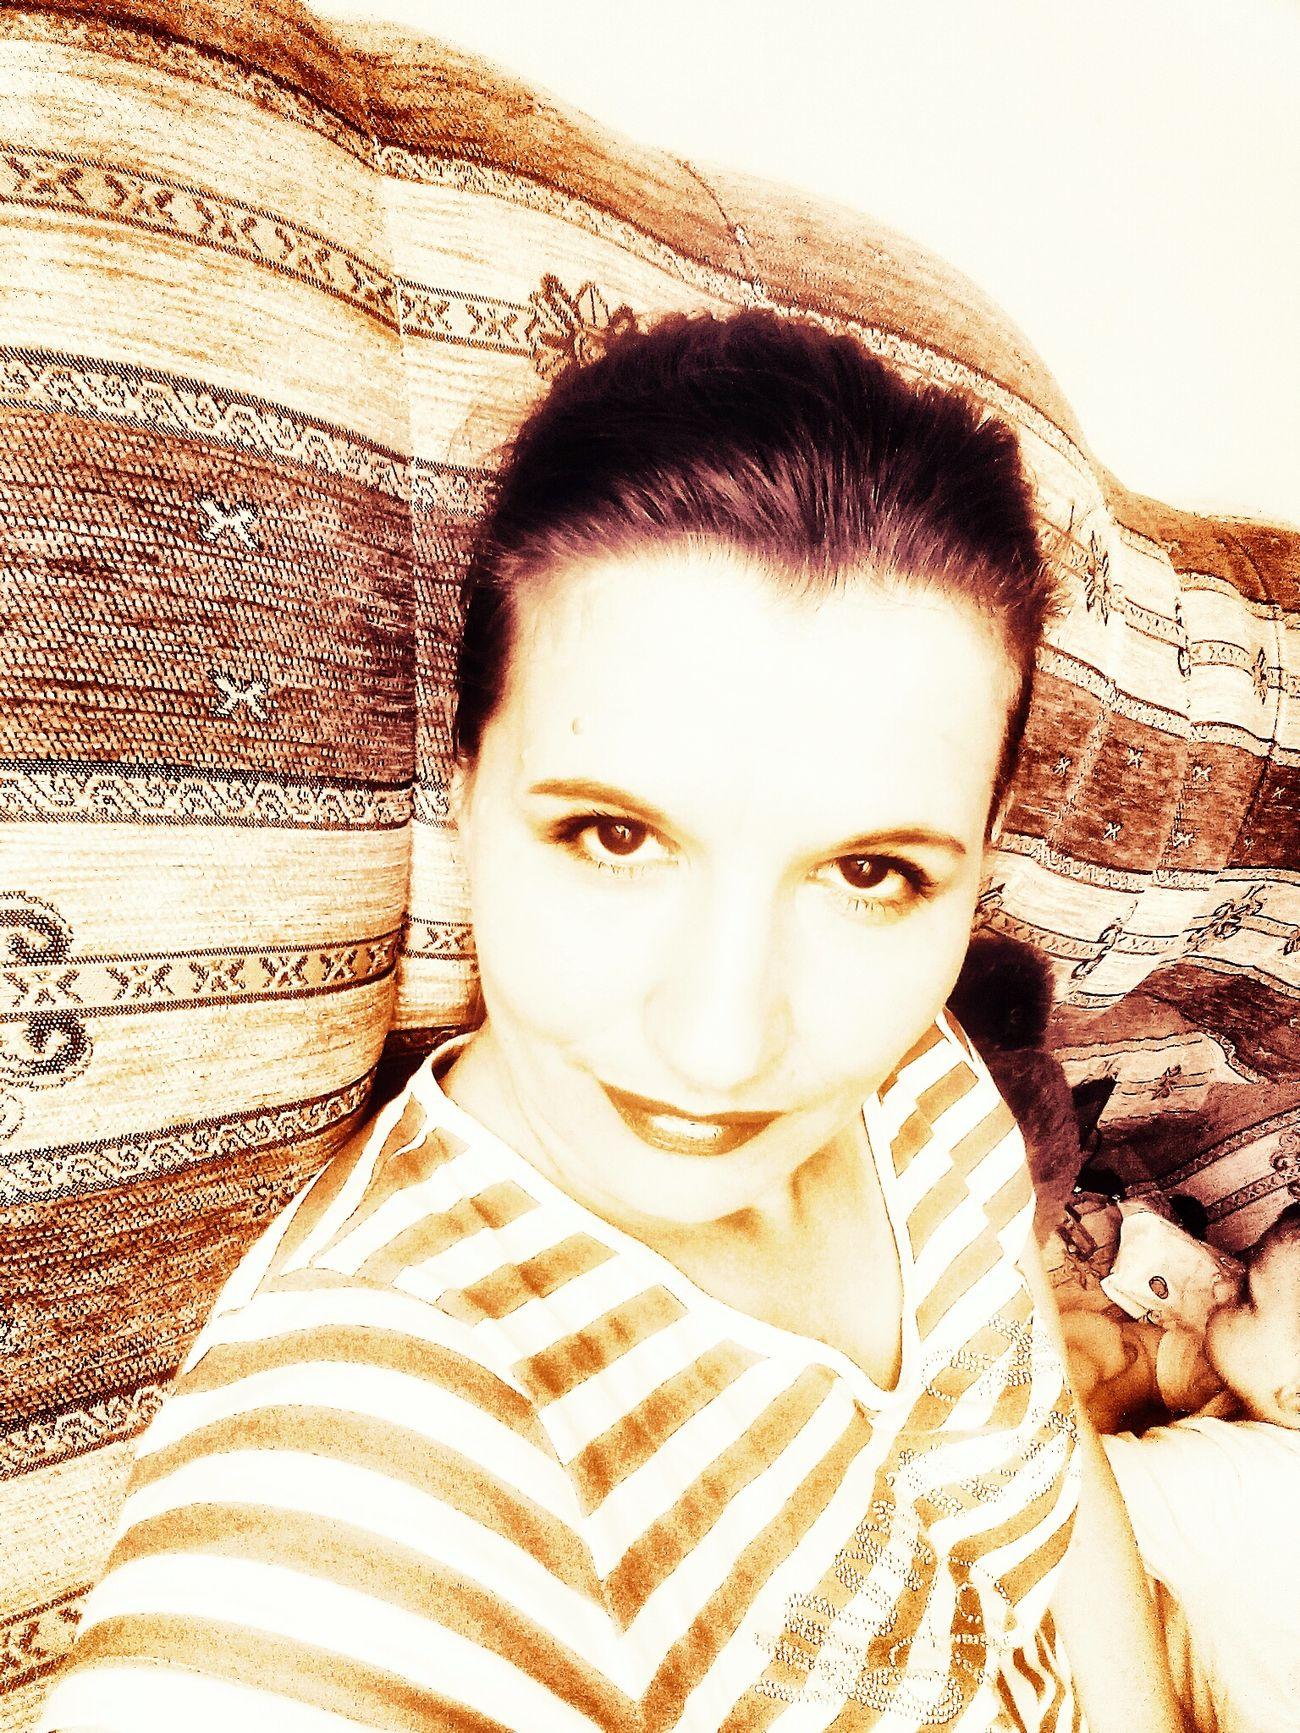 Good Morning ☺ Good GoodMorning⛅ Selfie Self Portrait Fallow Me Kisses❌⭕❌⭕